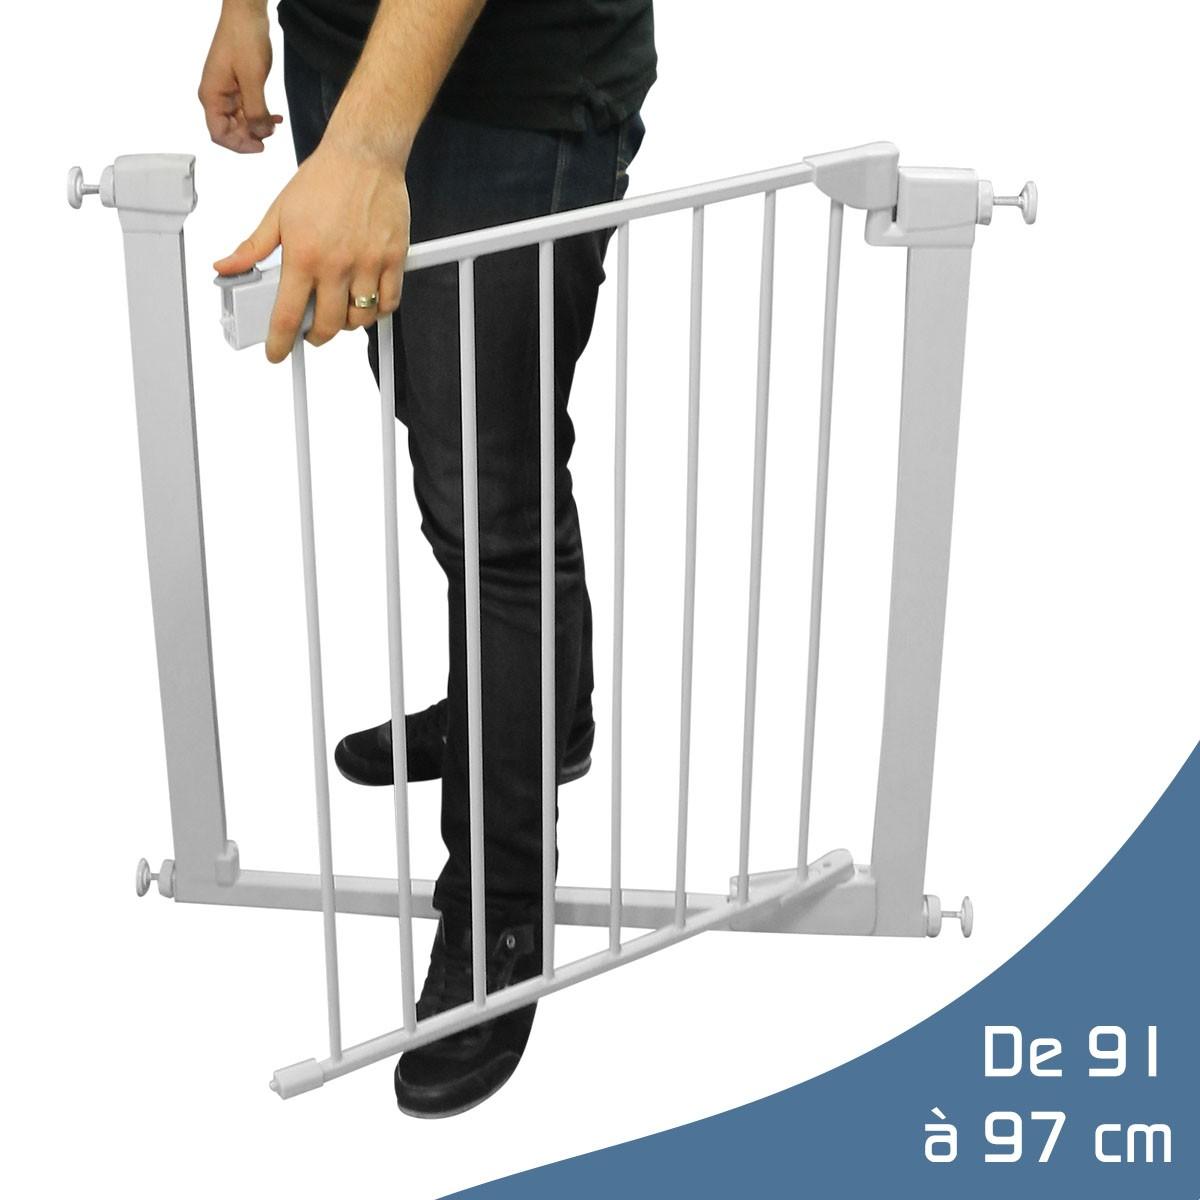 Monsieur b b barri re de s curit 79cm 98cm - Ikea barriere de securite ...